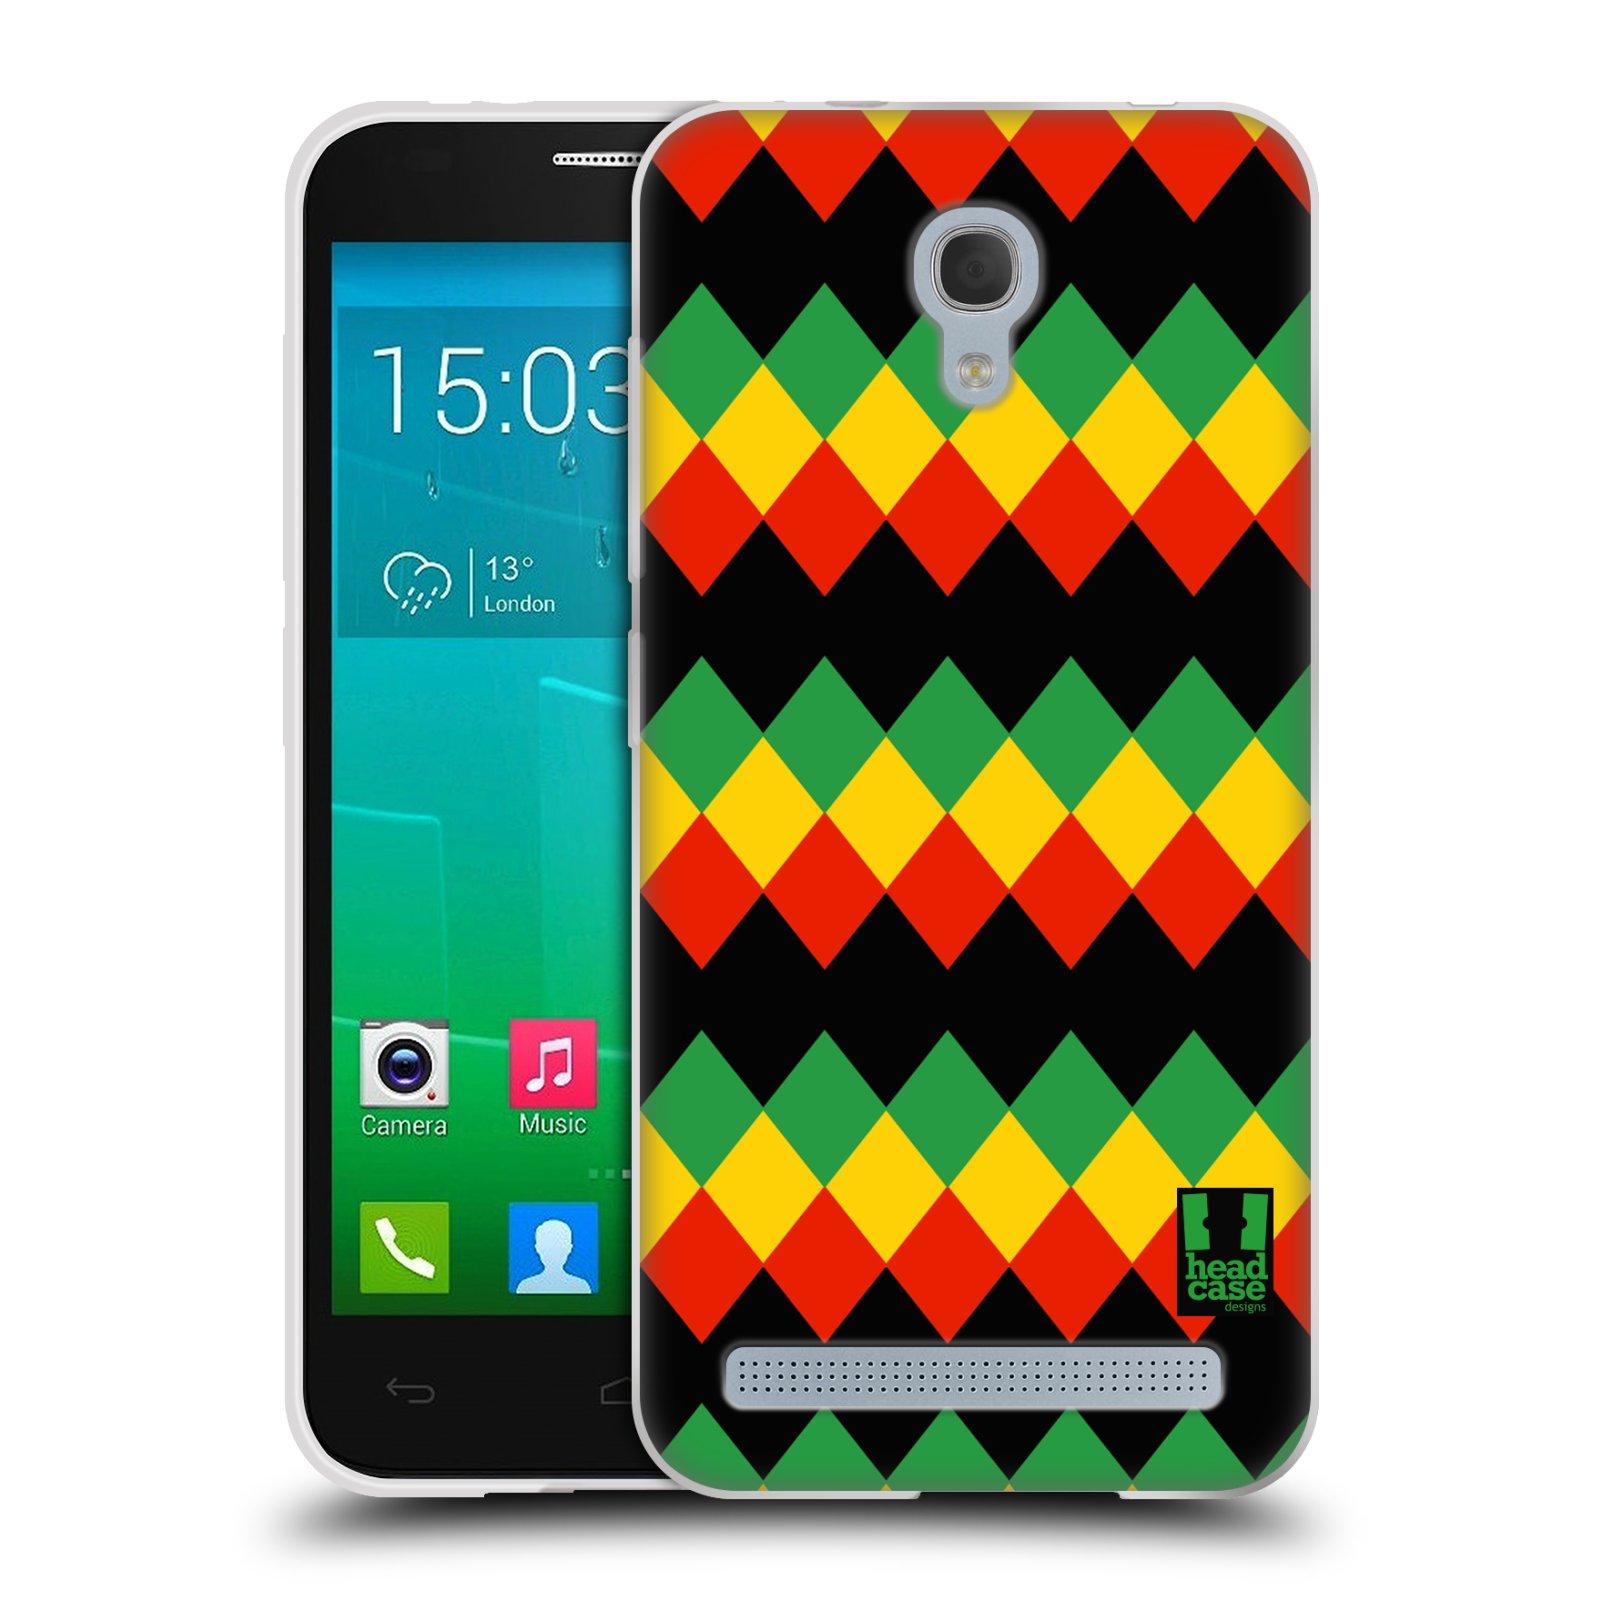 HEAD CASE silikonový obal na mobil Alcatel Idol 2 MINI S 6036Y vzor Rasta barevné vzory DIAMANT